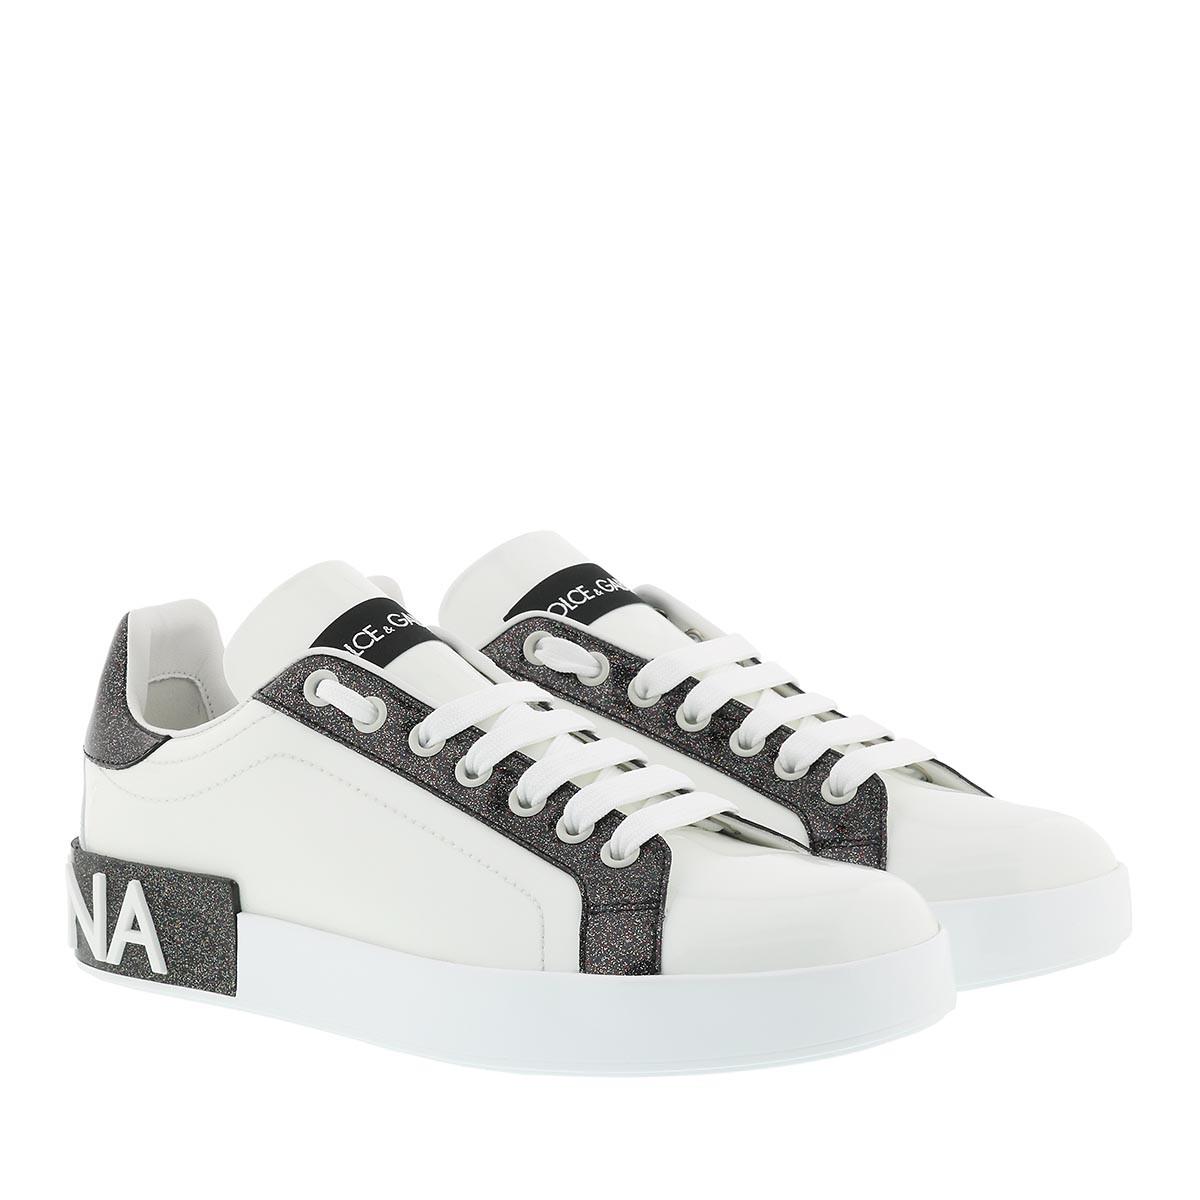 Dolce&Gabbana Sneakers - Portofino Sneakers White/Black - in weiß - für Damen